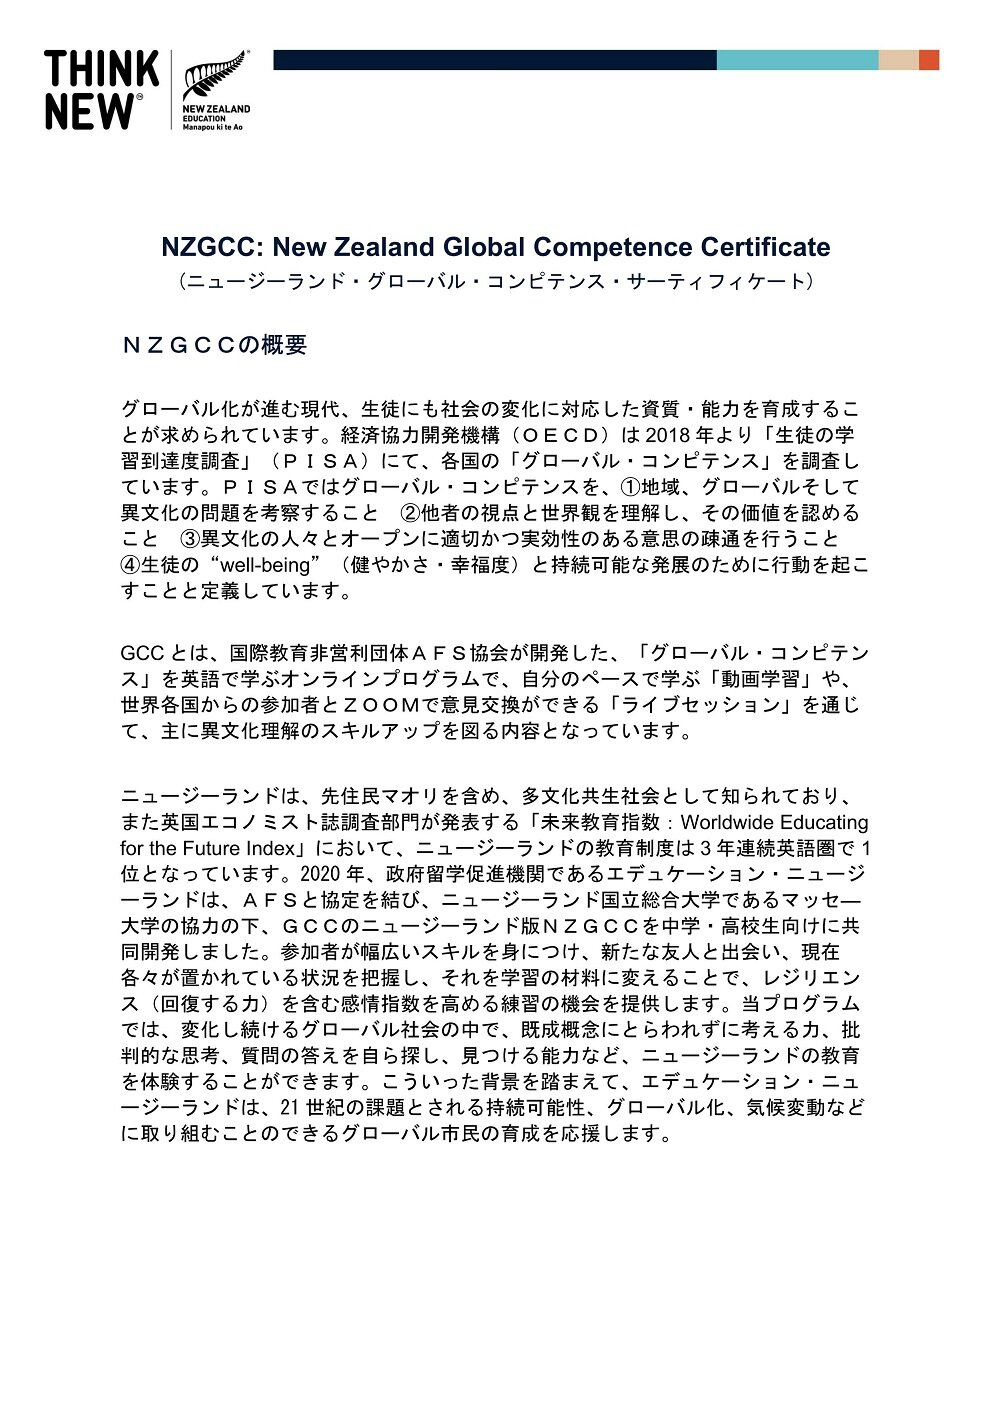 NZGCC.jpg